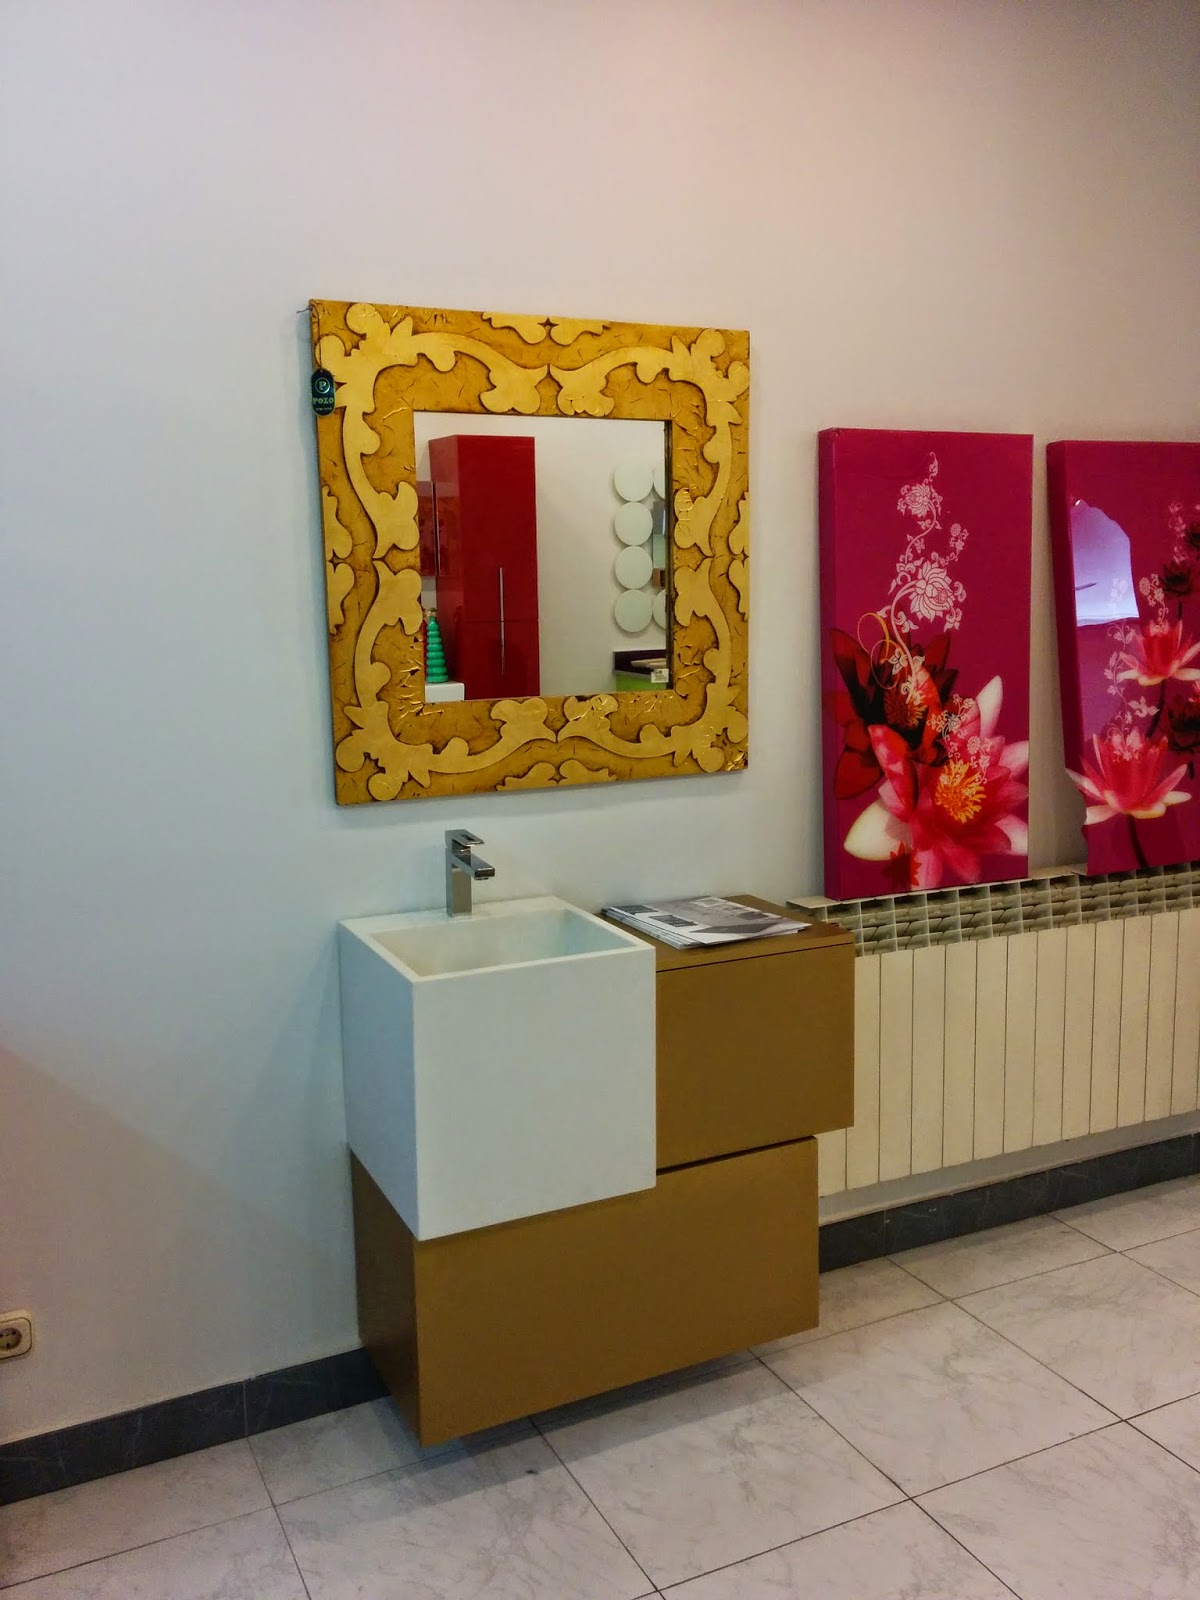 Muebles El Pozo Dise Os Arquitect Nicos Mimasku Com # Iberica Muebles